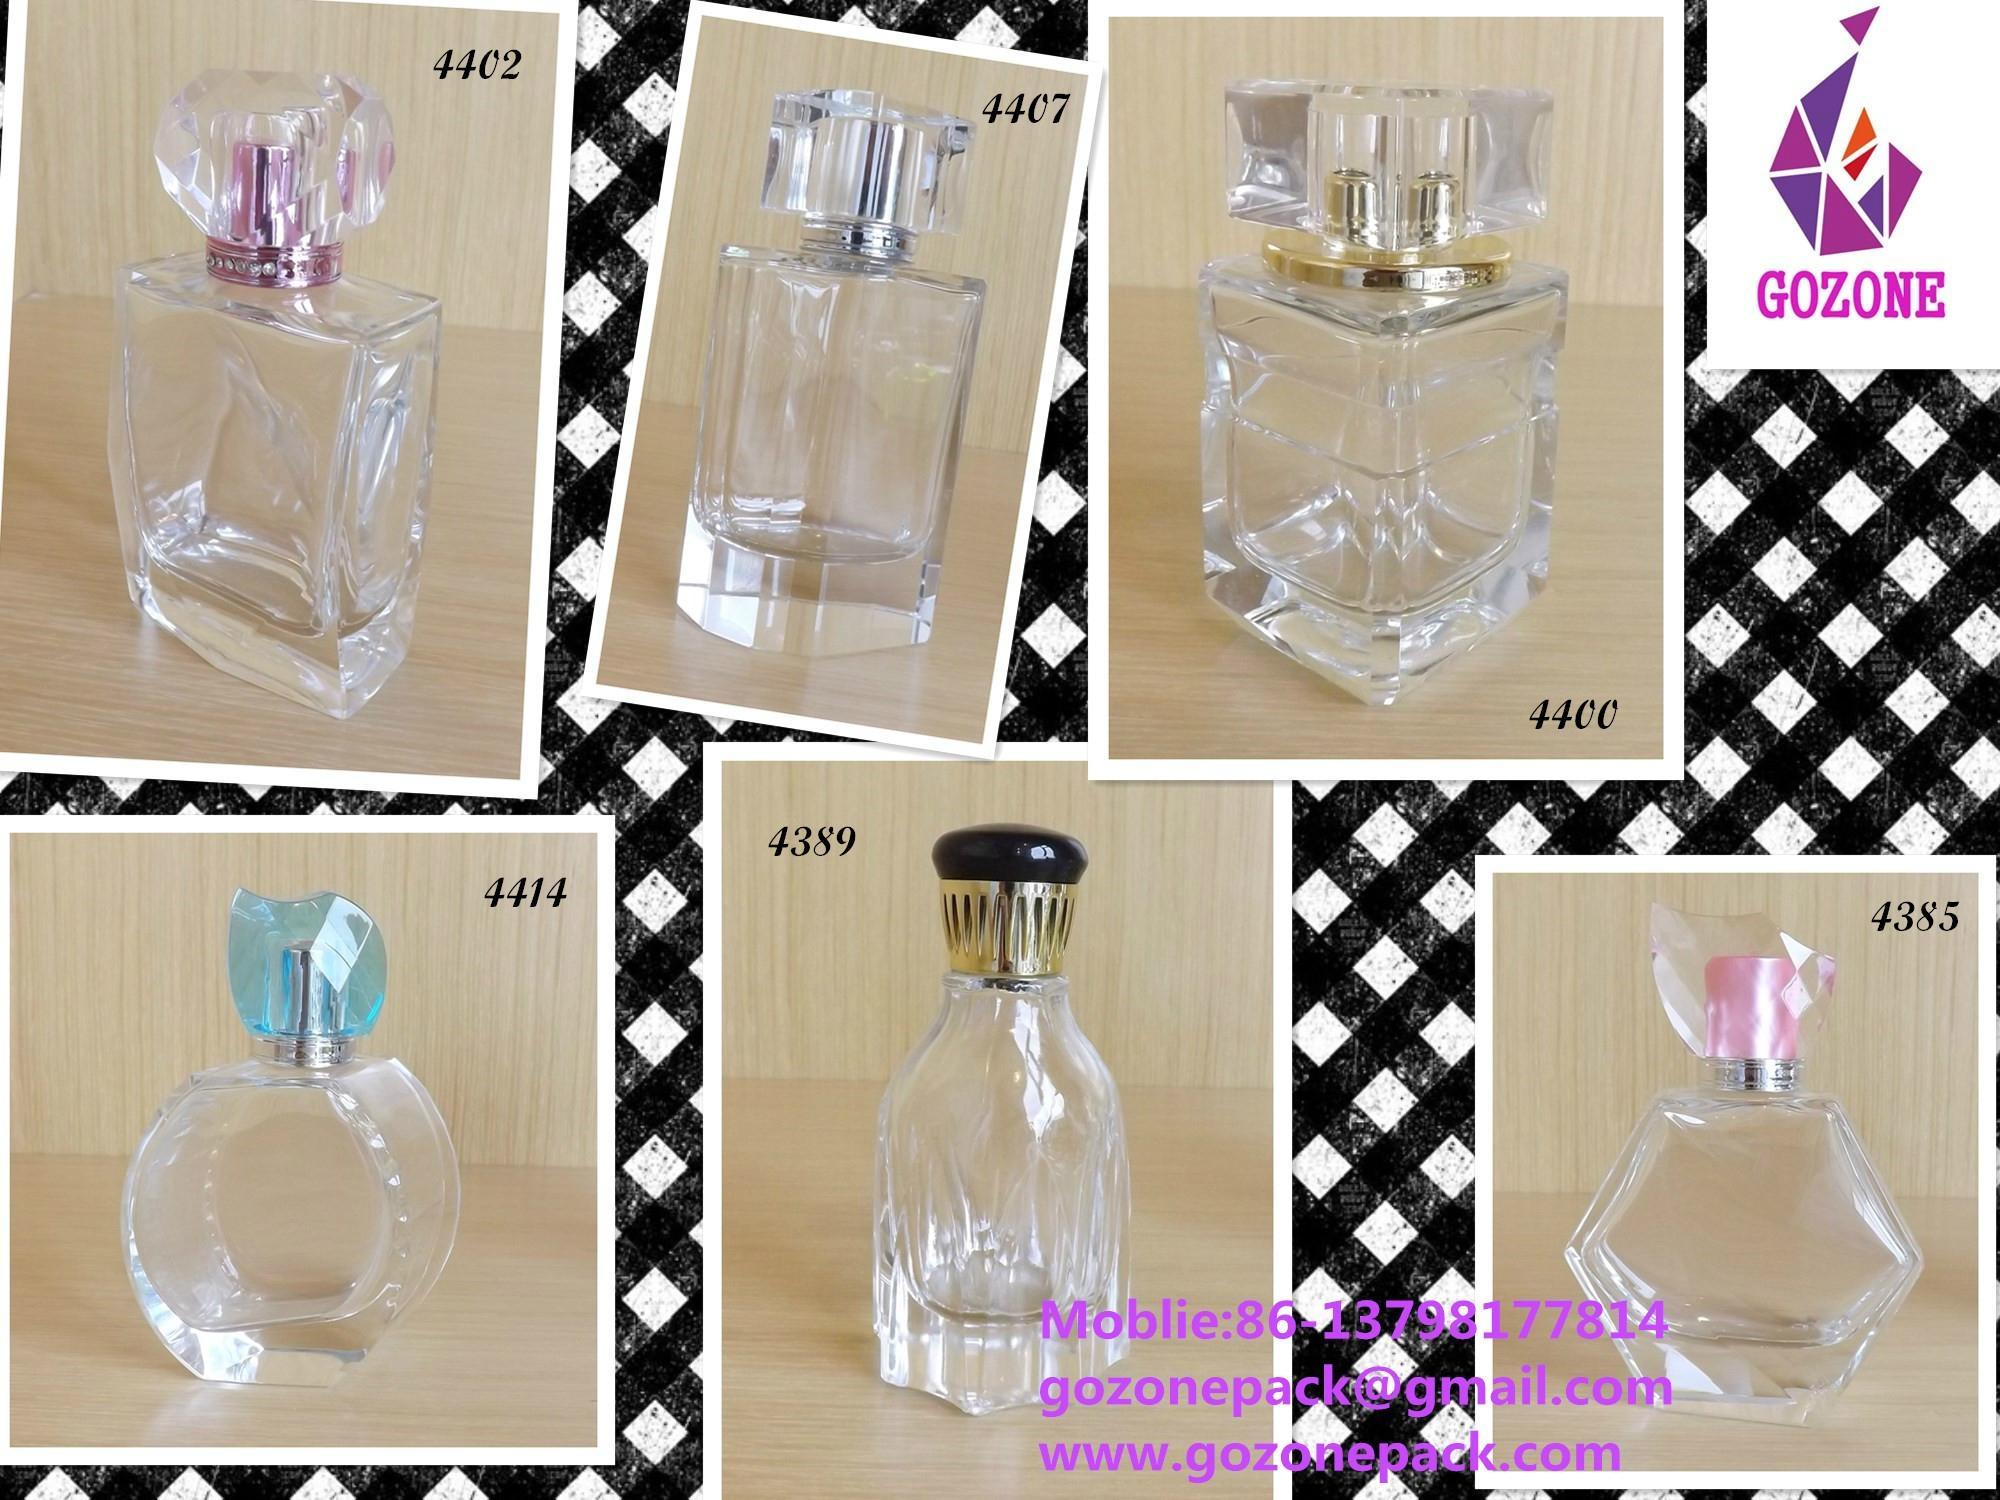 perfume bottle 1